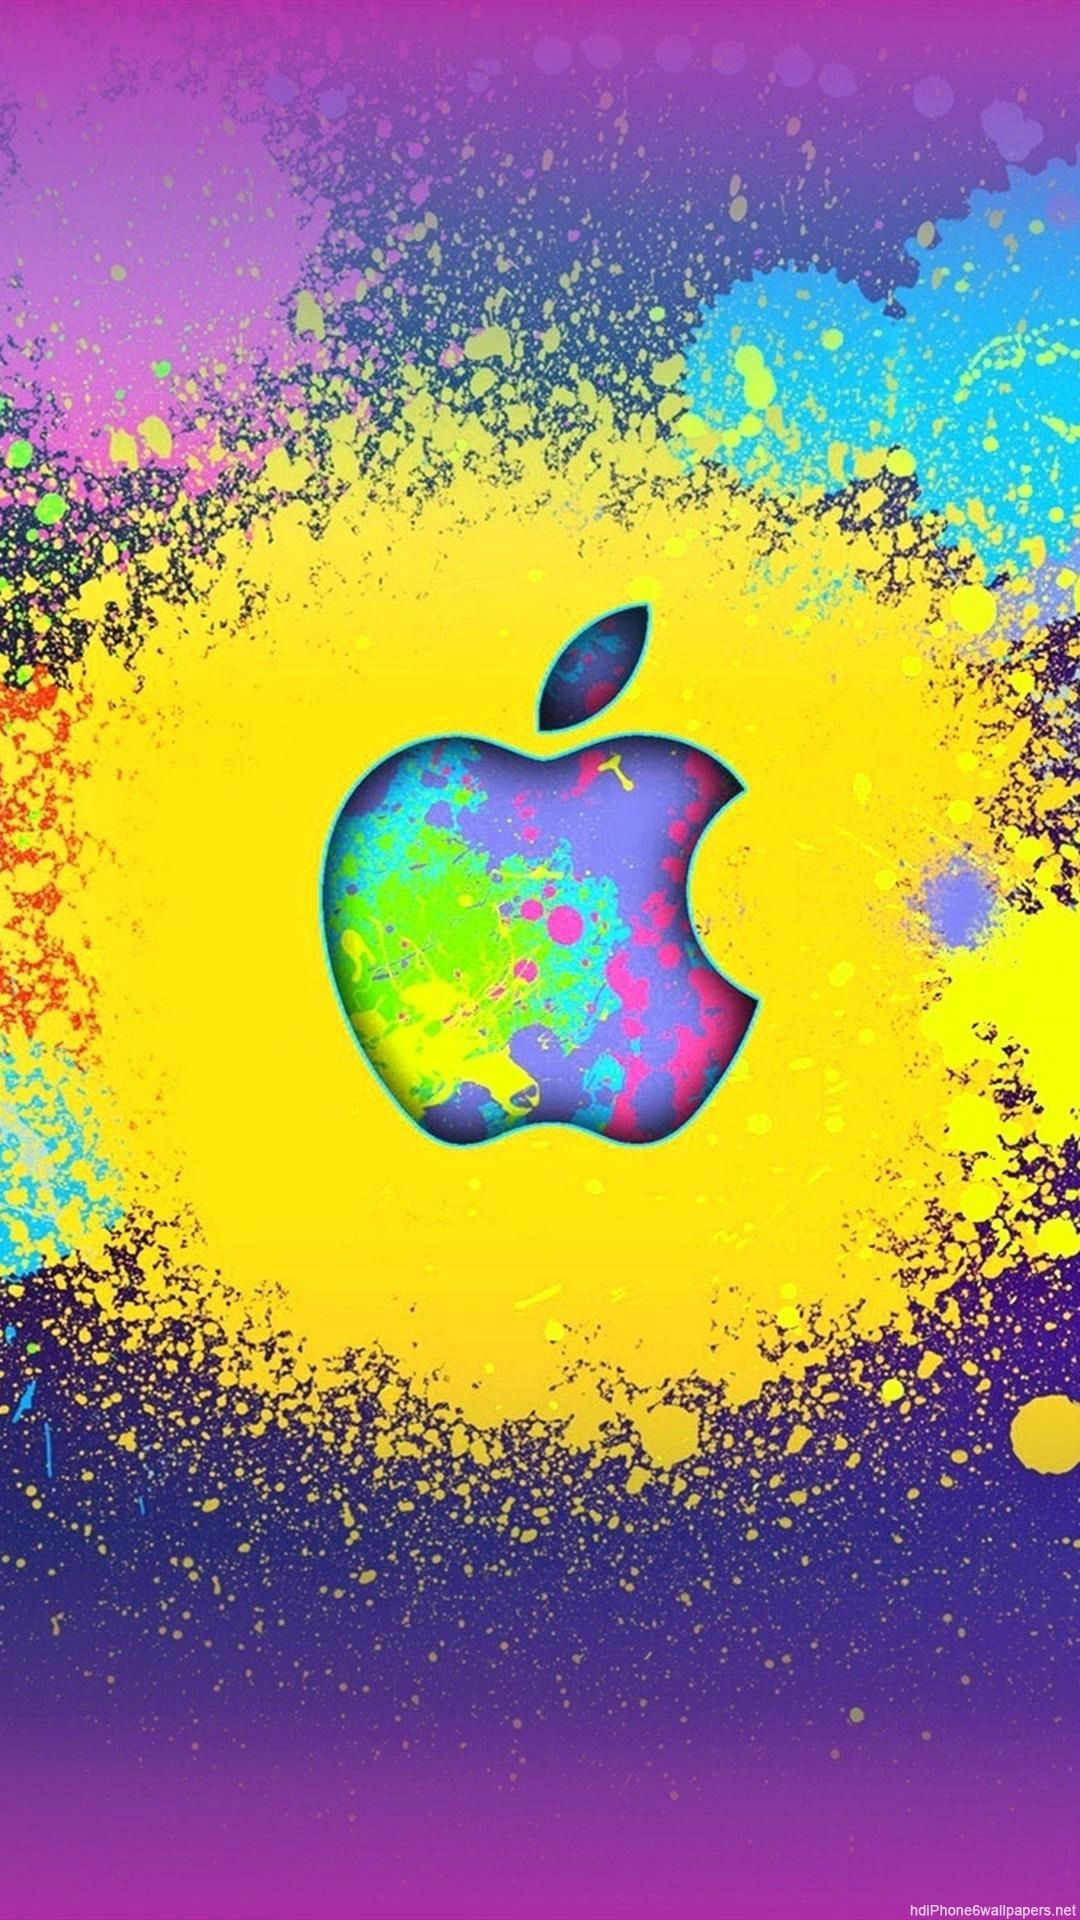 Apple Iphone 6 Wallpaper Apple Wallpaper Iphone Apple